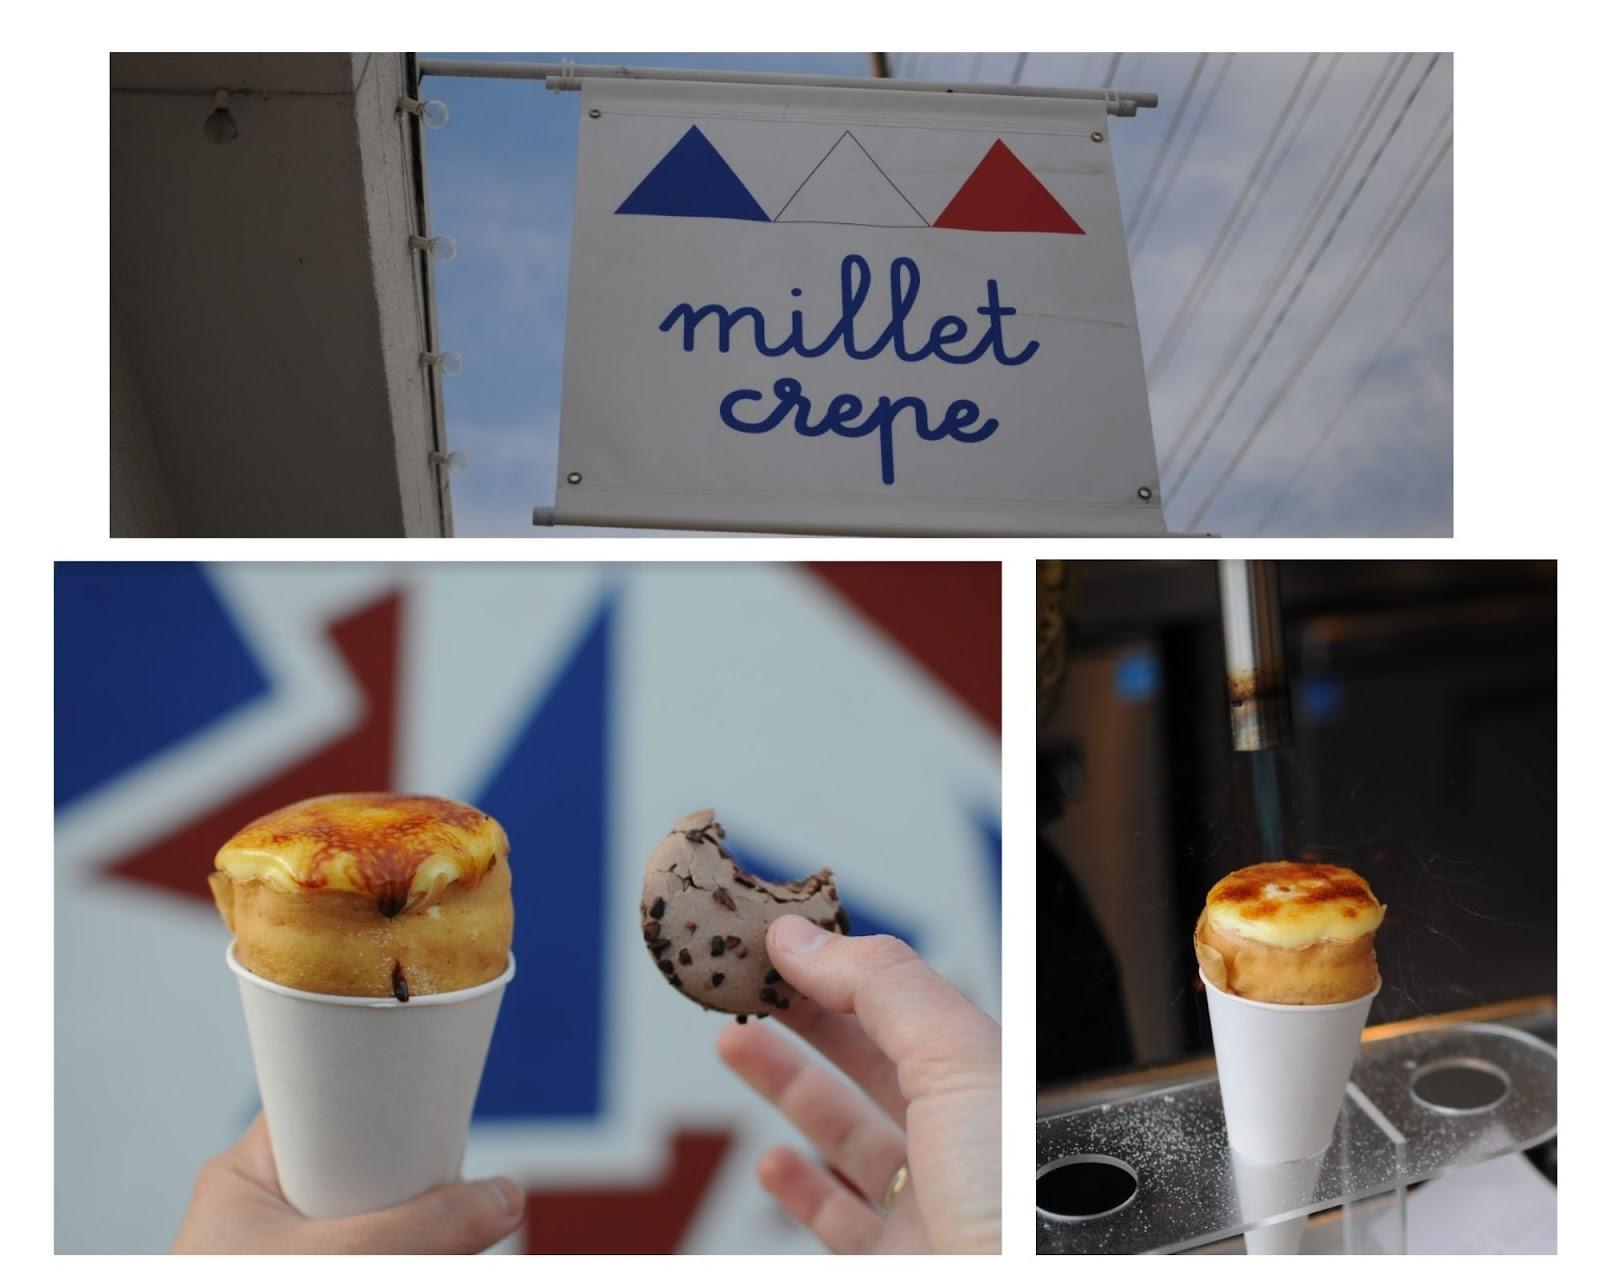 6pm Millet Crepe